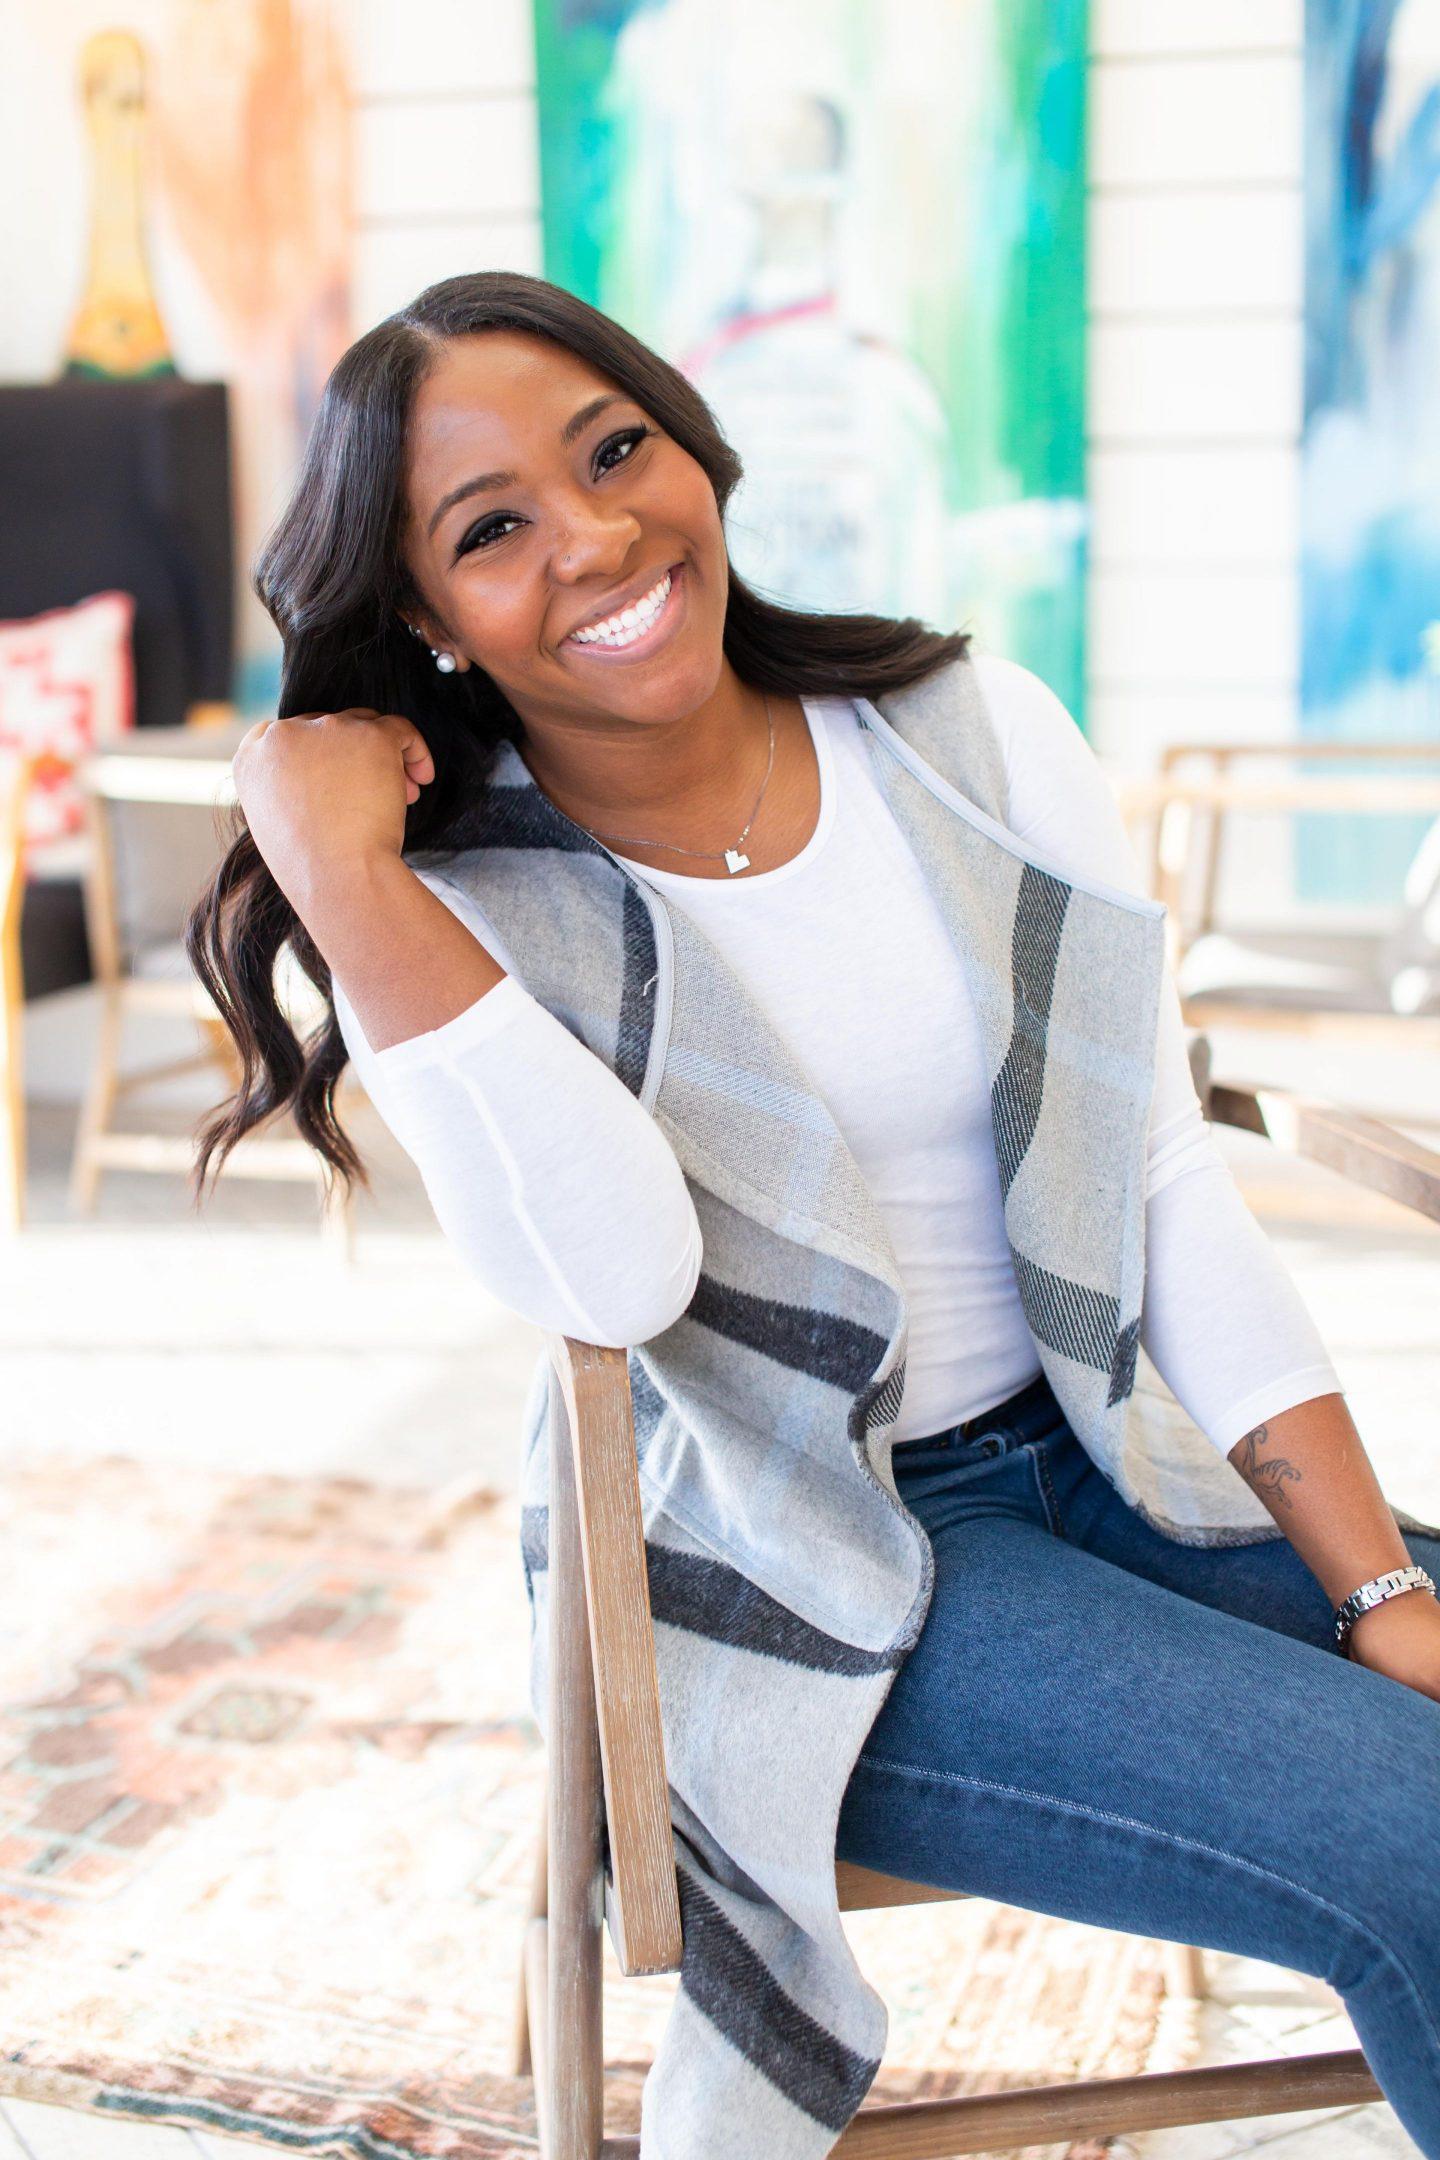 Leigh Love: Blogger, Business Professional, and HBCU Spelman Grad